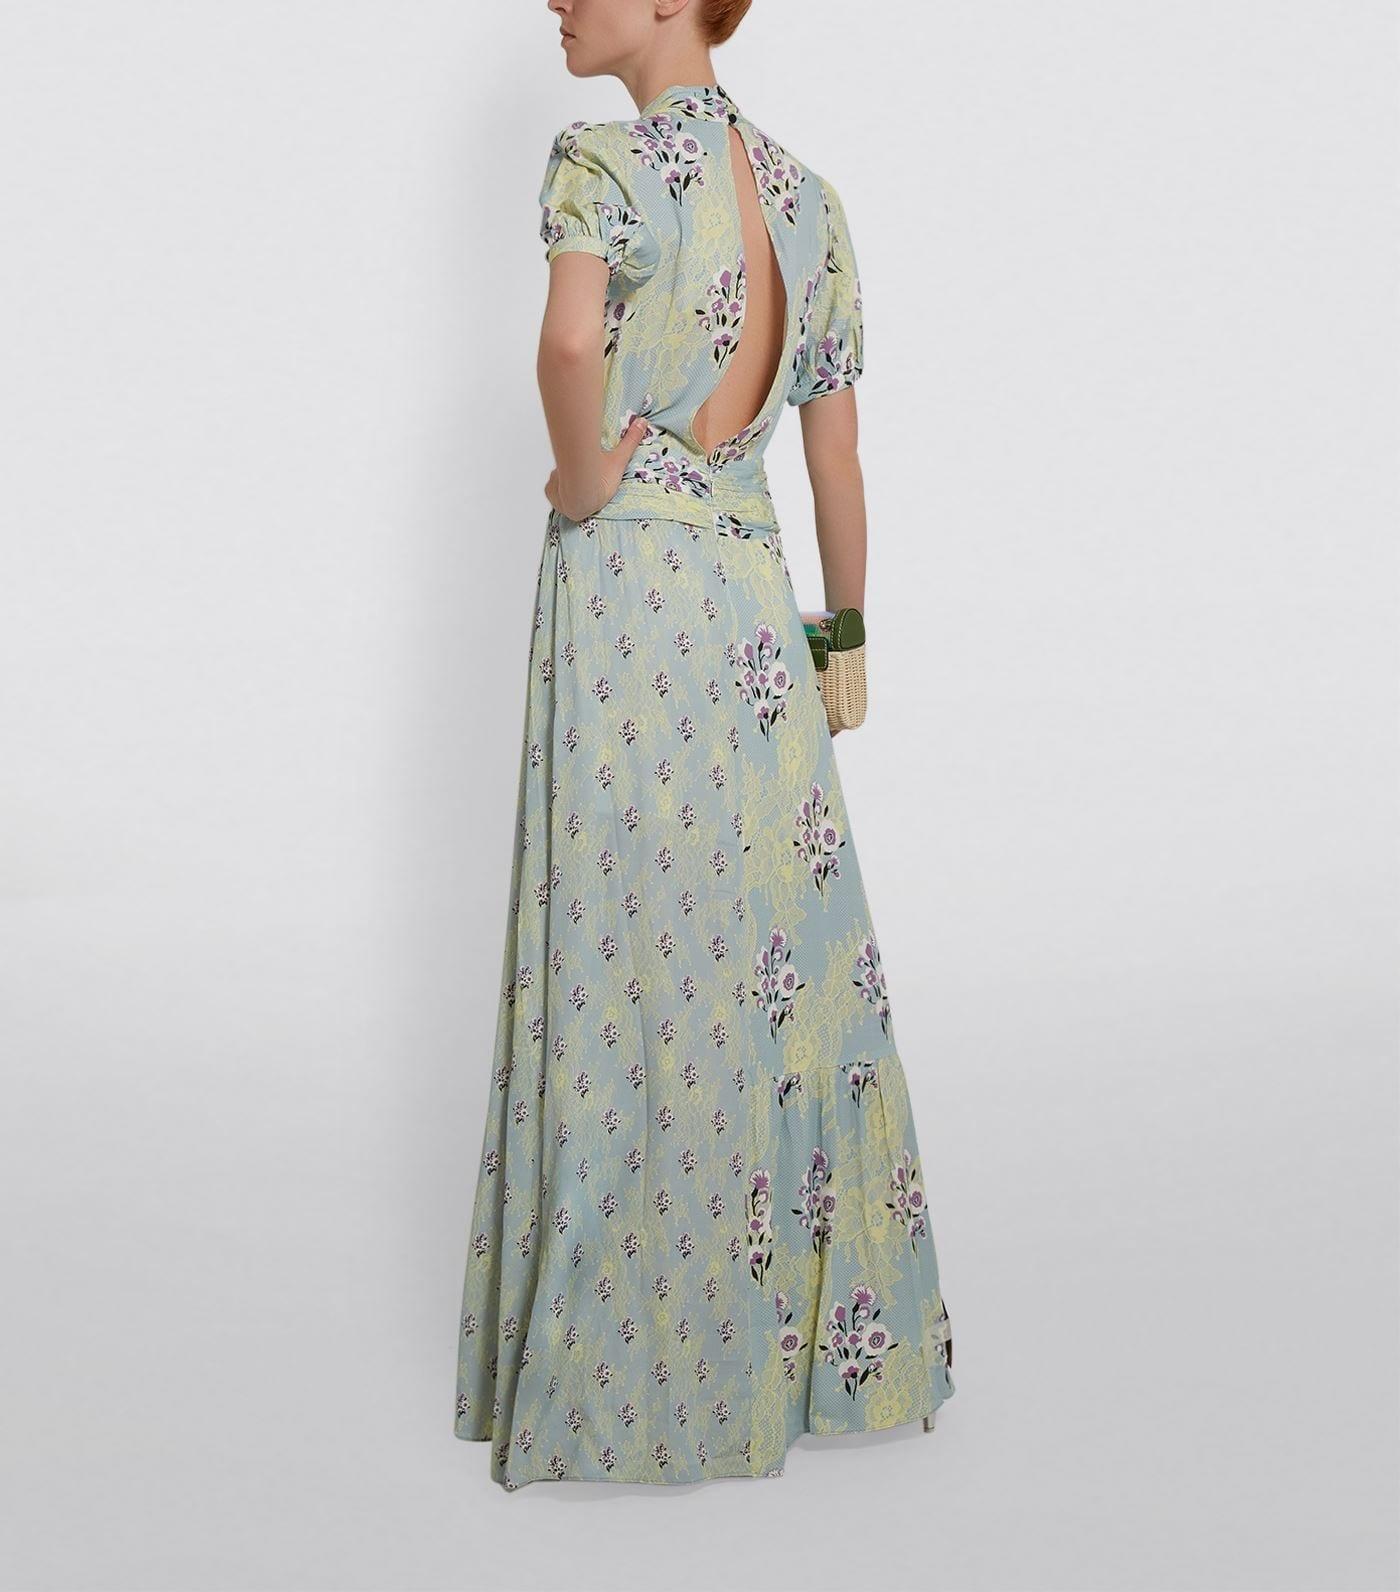 SELF-PORTRAIT Floral and Lace Print Maxi Dress